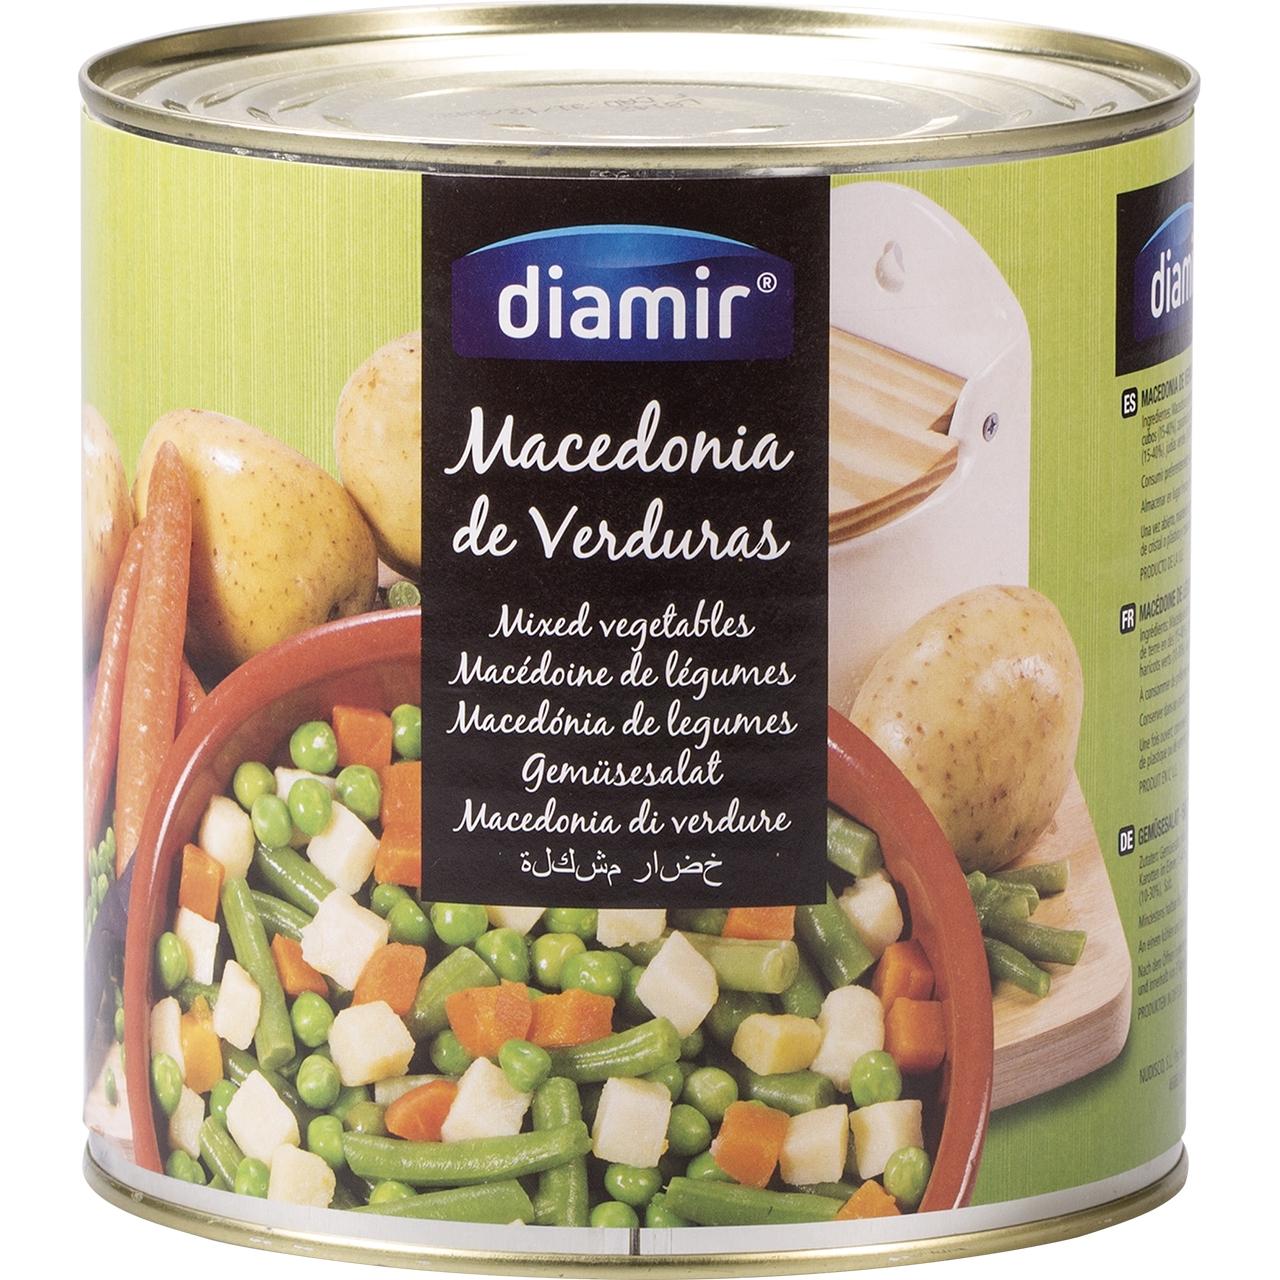 Macedònia verdures 3kg. Diamir